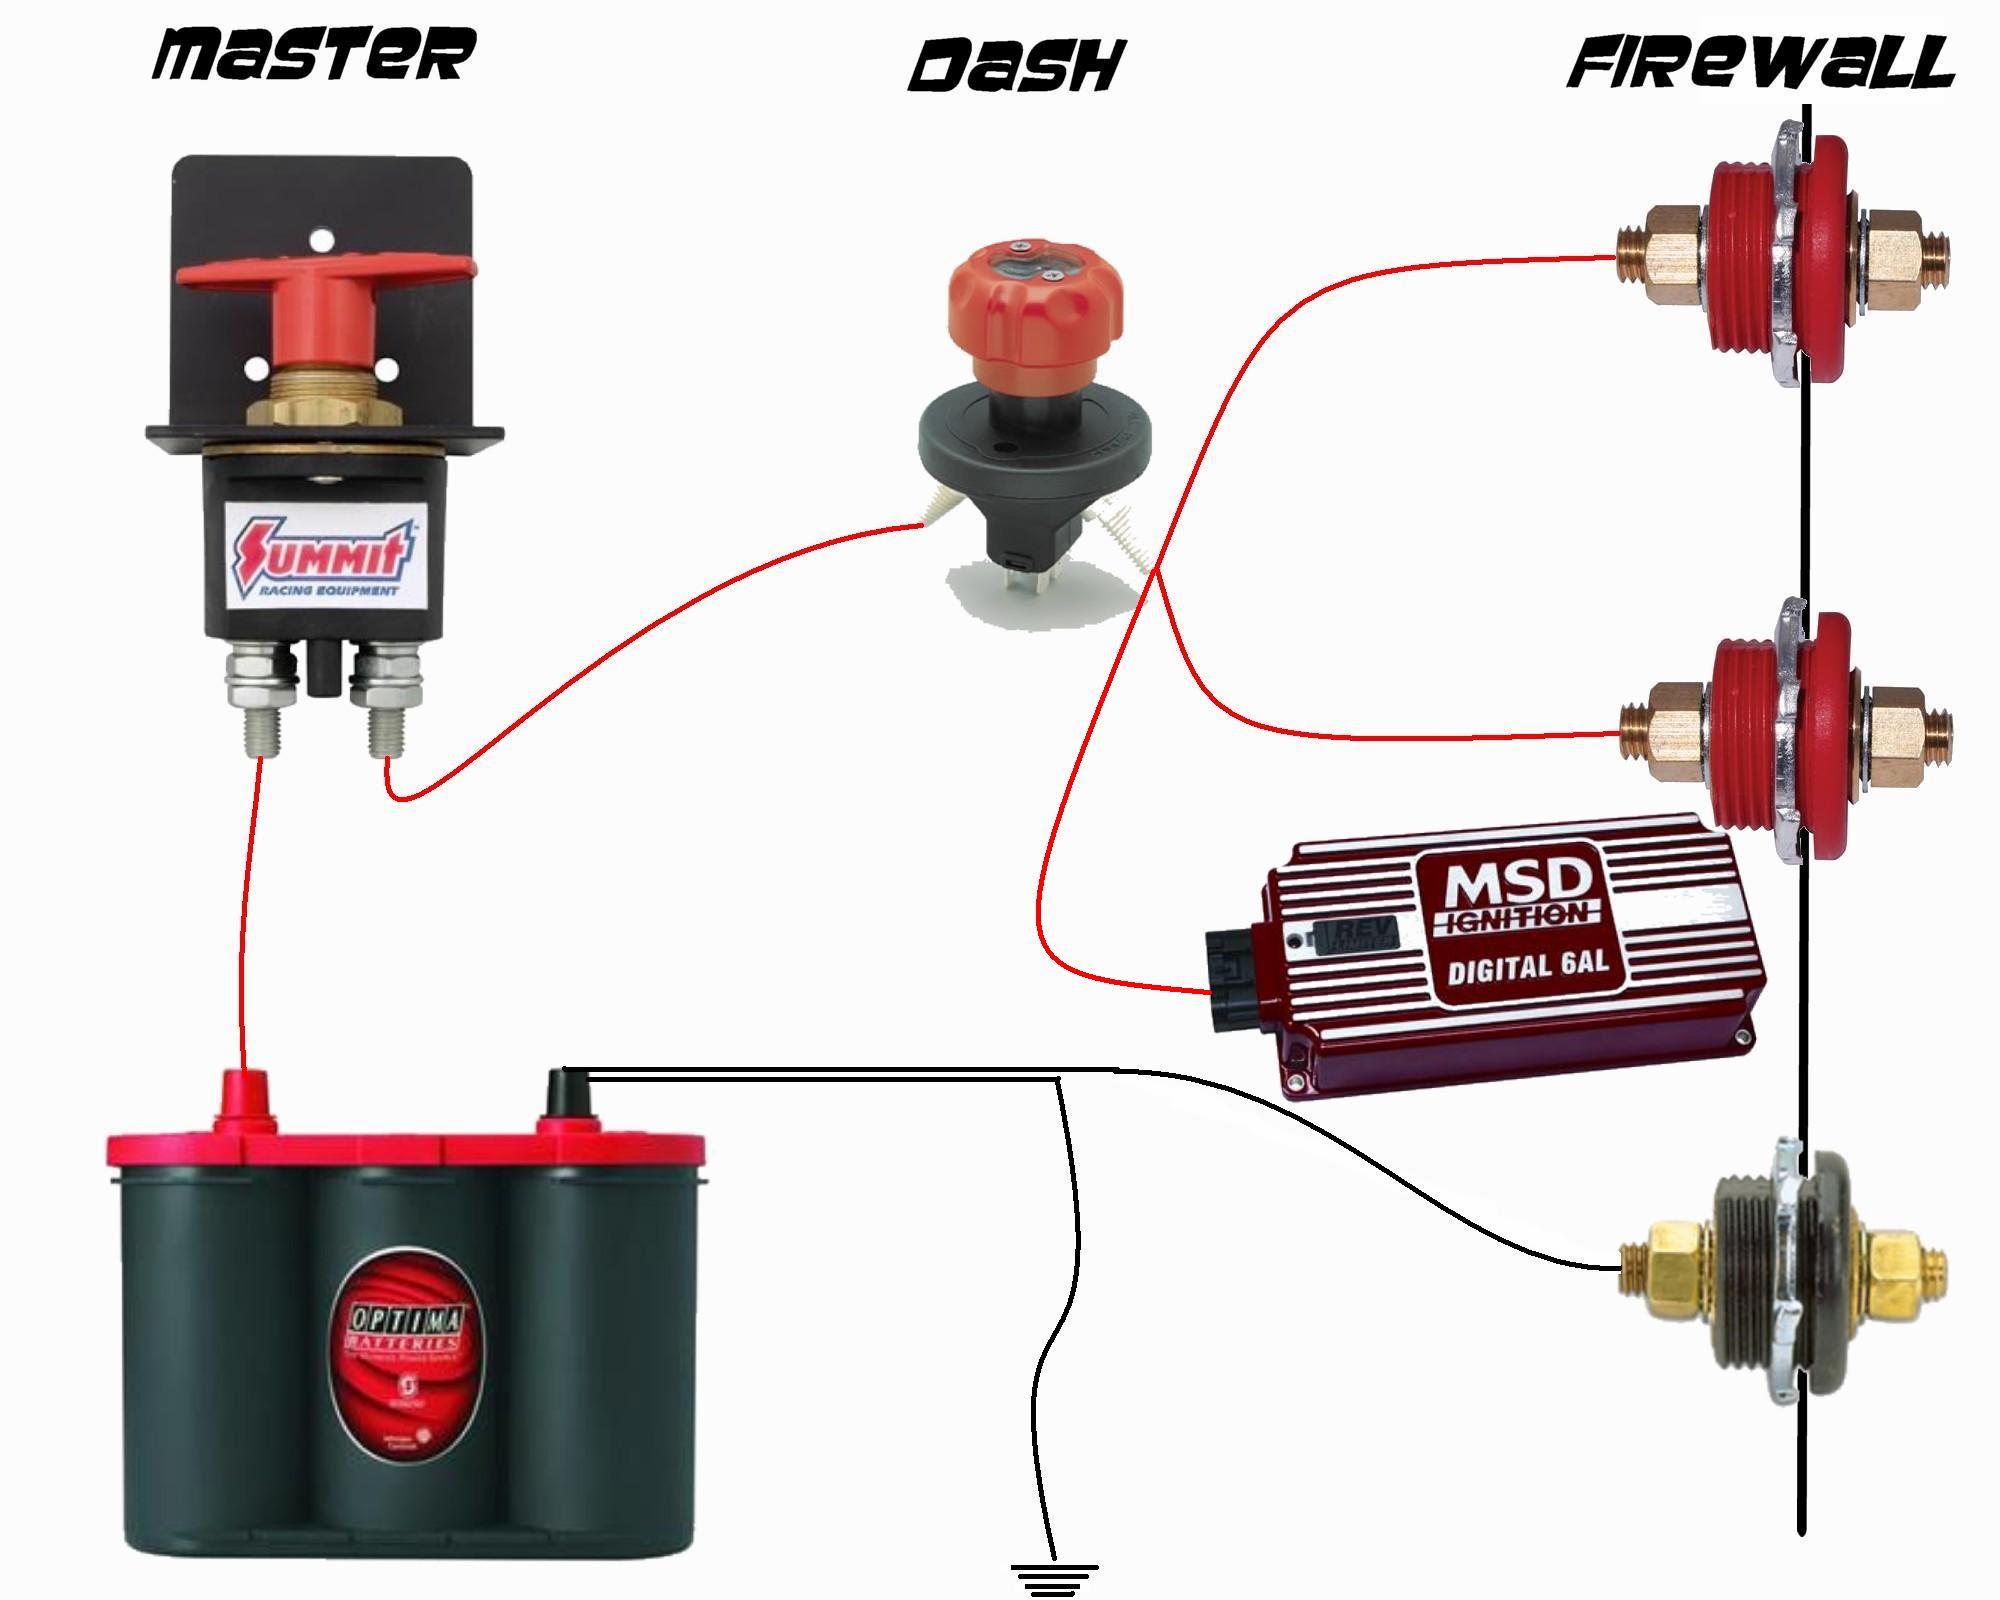 Msd Alternator Wiring Diagram